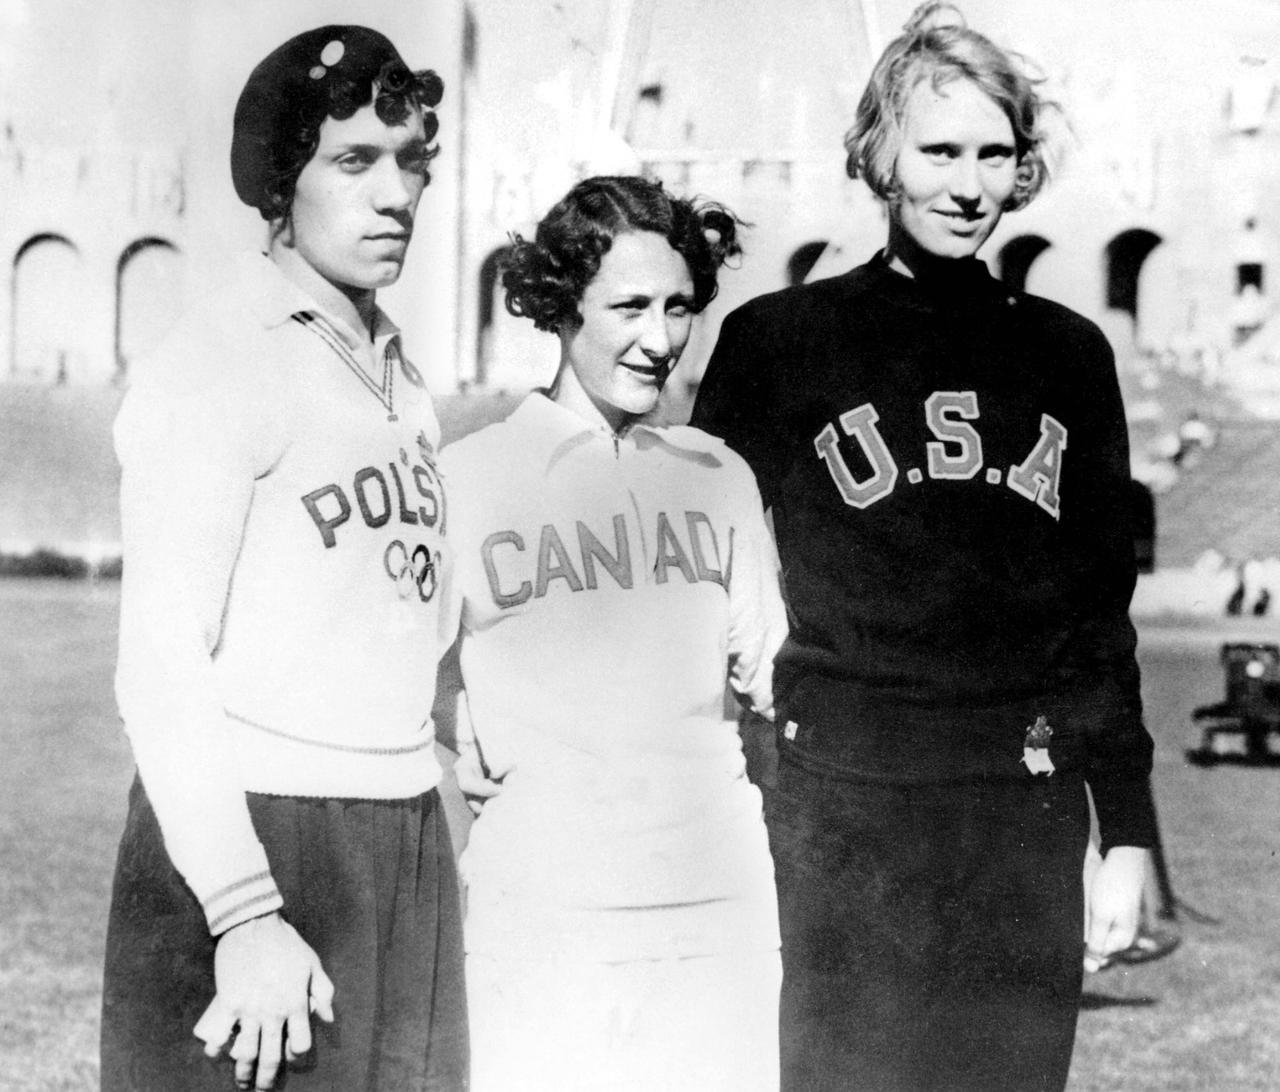 1932 Los Angeles Summer Olympics – Women's 100 metres medal winners - Poland's Stanisława Walasiewicz (Gold), Canada's Hilda Strike (Silver), and USA's Wilhelmina von Bremen (Bronze)